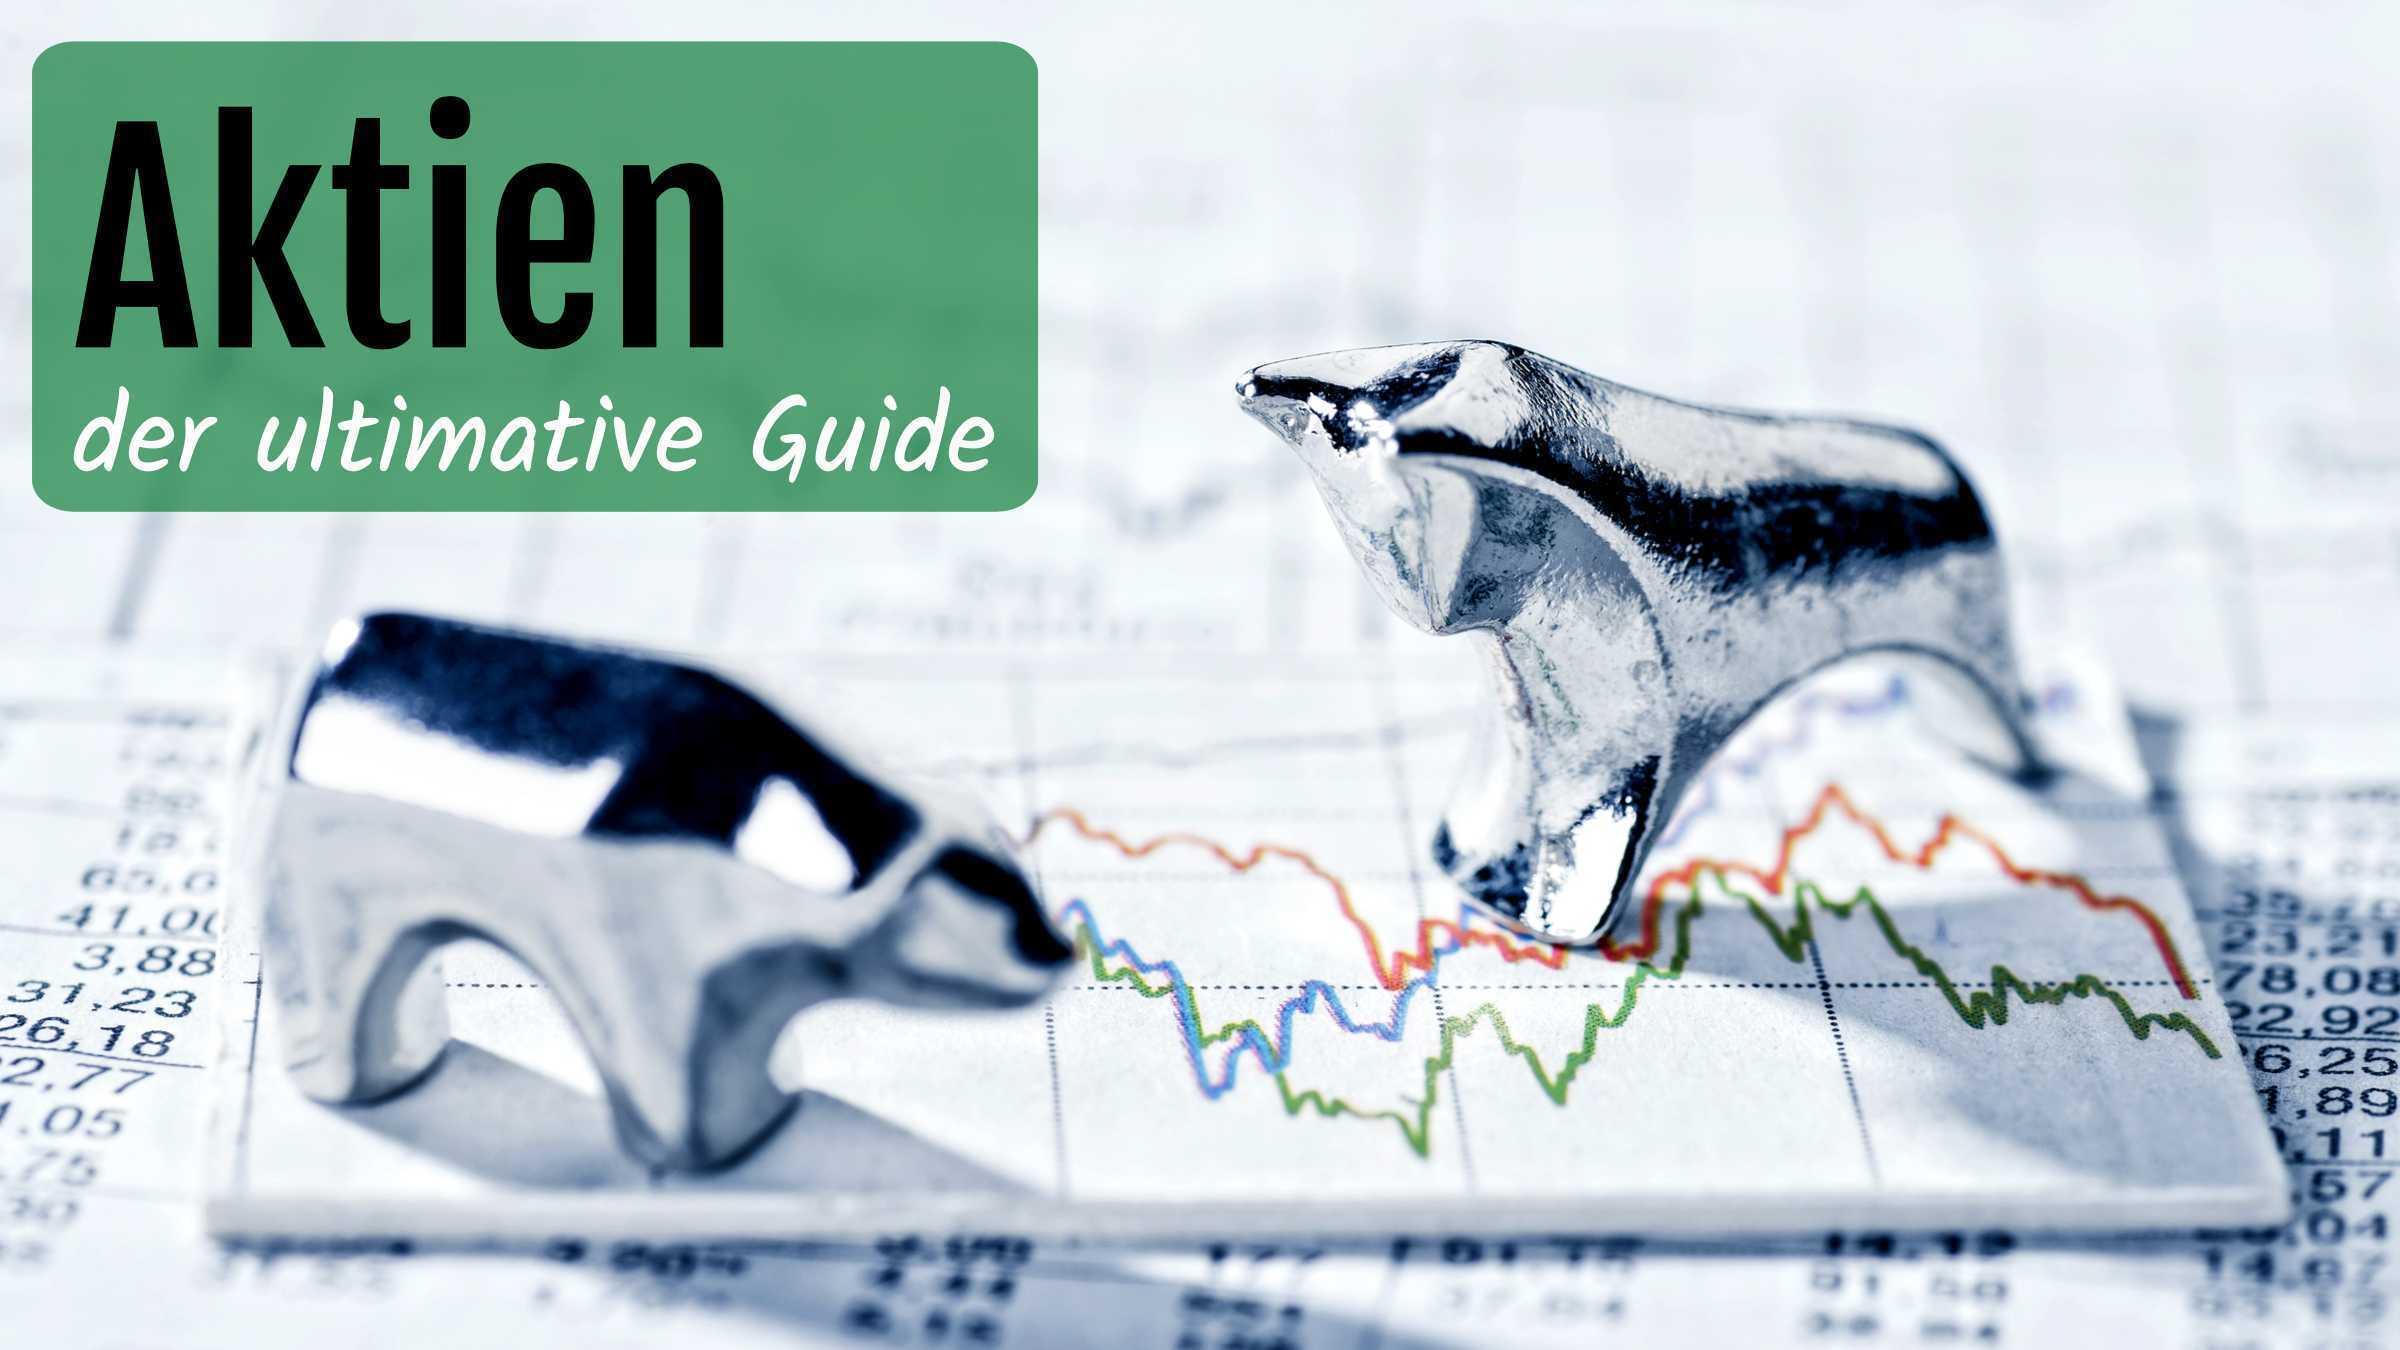 Aktien: der ultimative Guide